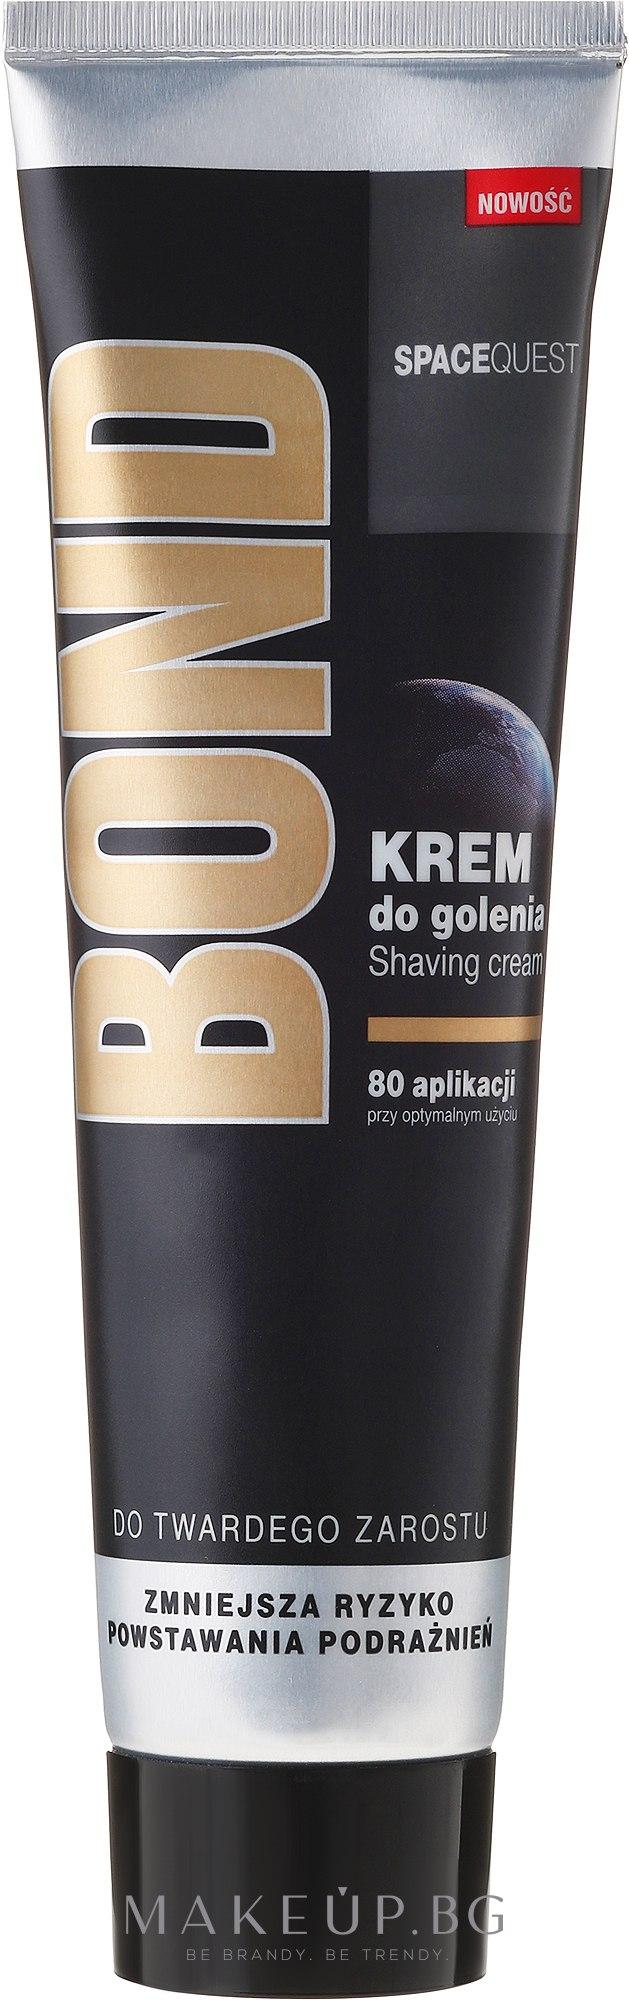 Крем за бръснене с глицерин - Pharma CF Bond Shaving Cream — снимка 100 ml